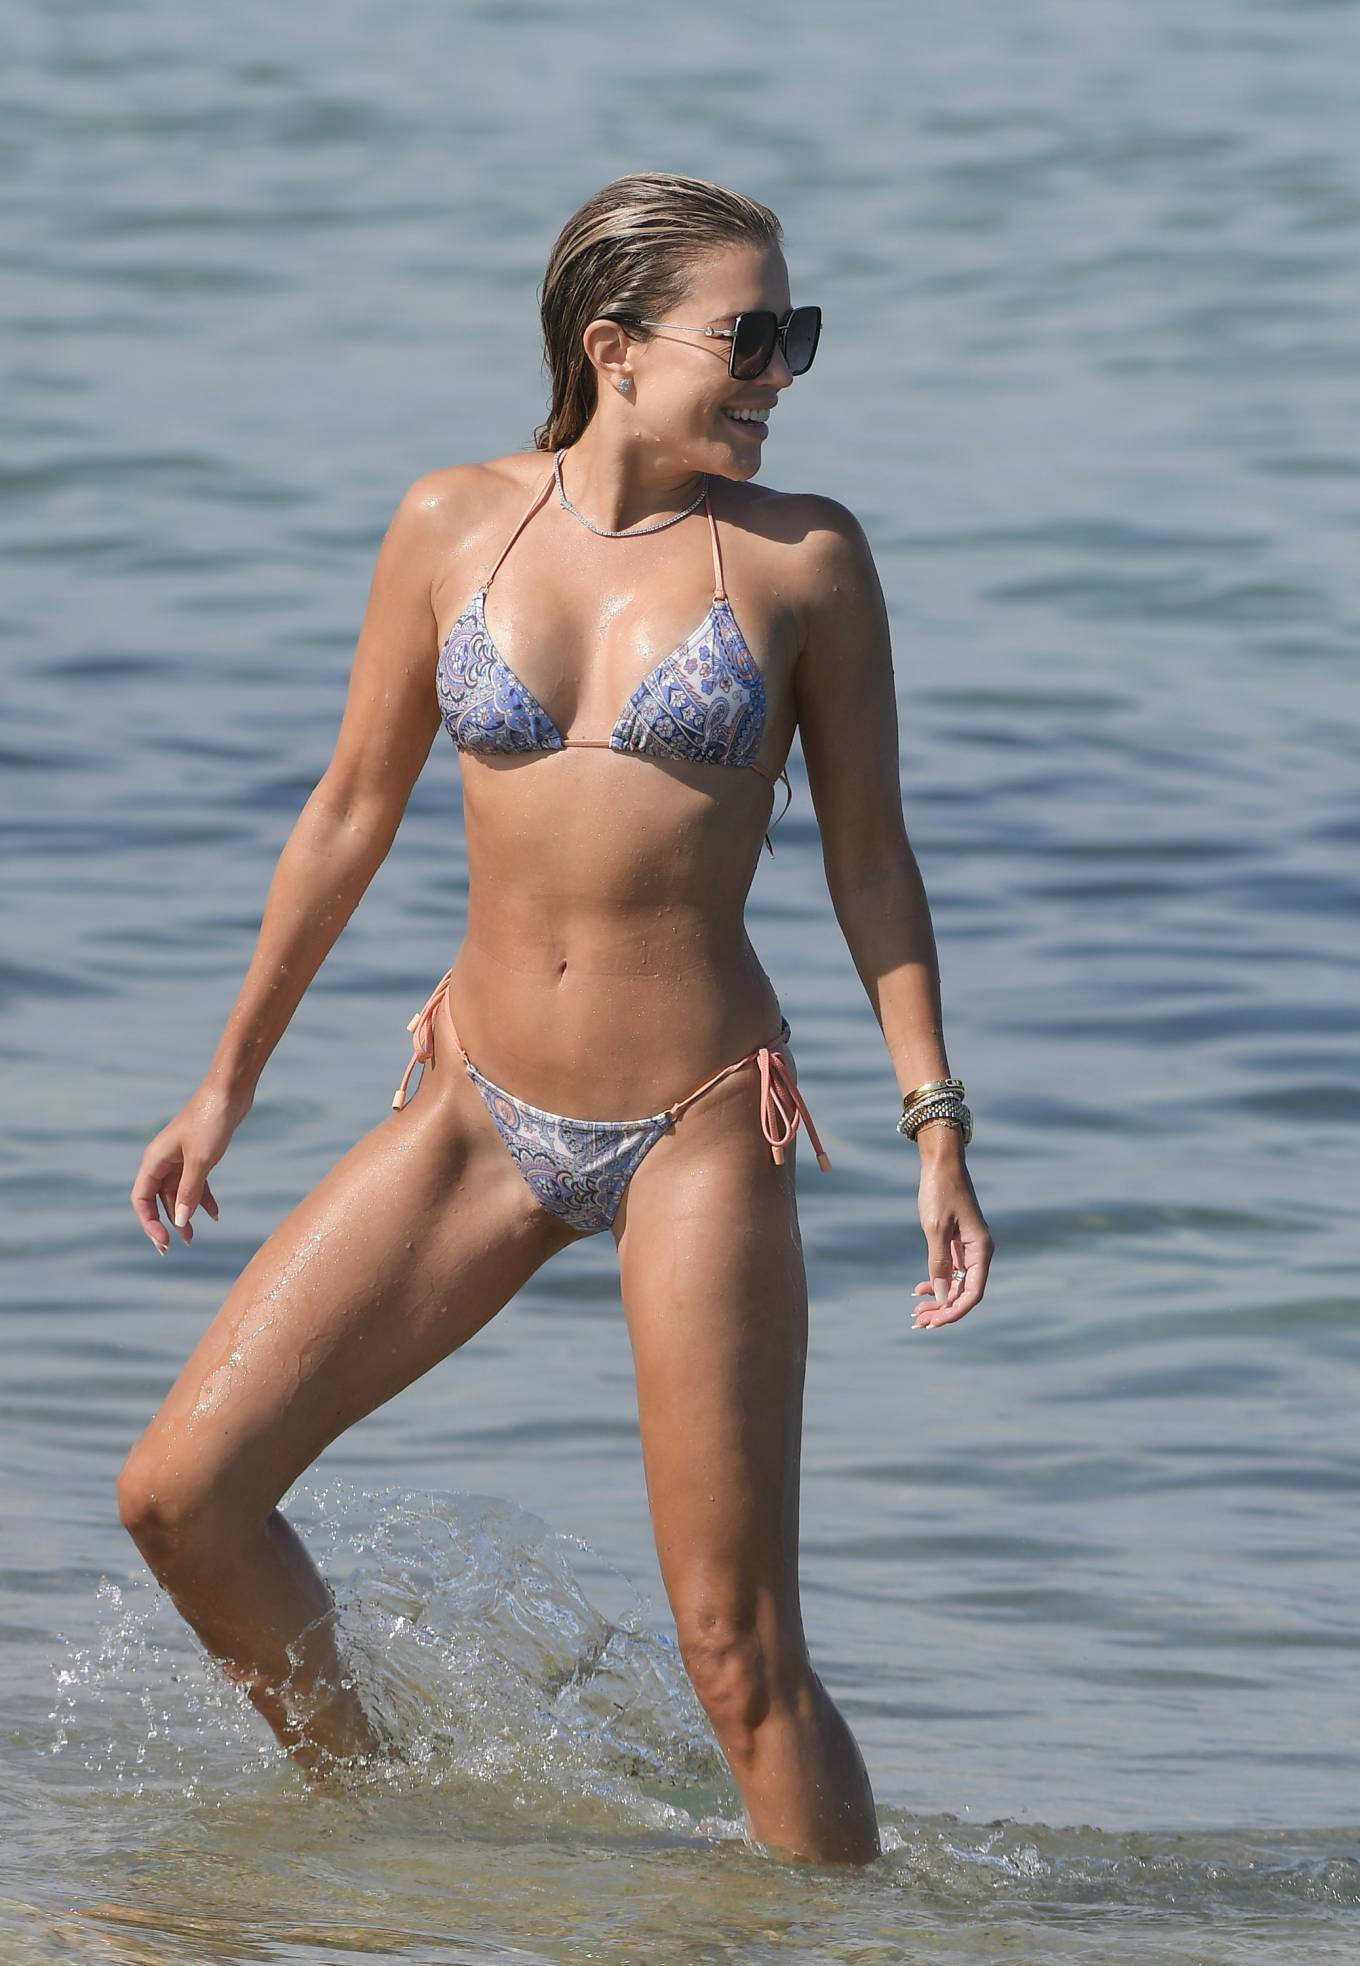 Sylvie Meis 2021 : Sylvie Meis – In a bikini with her husband Niclas Castello on the beach La Réserve in Ramatuelle-19